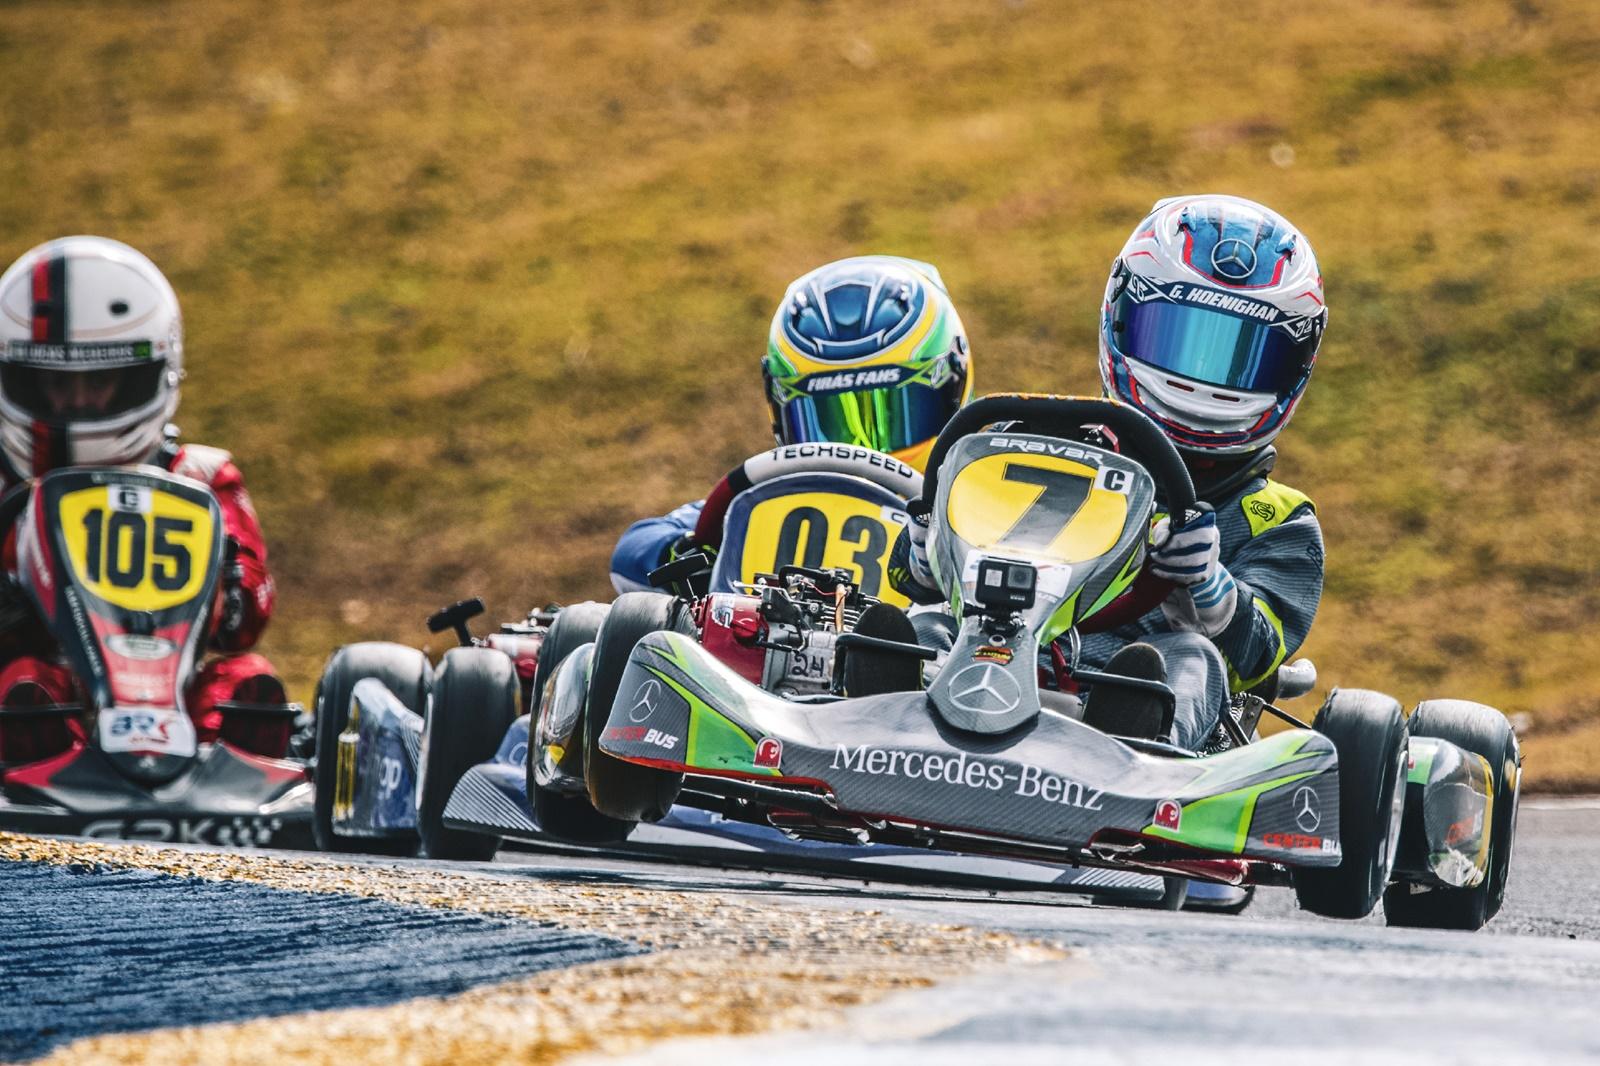 Photo of Kart – Segundo título de Gabriel Koenigkan no Campeonato Brasileiro de Kart escapou por pouco em Cascavel